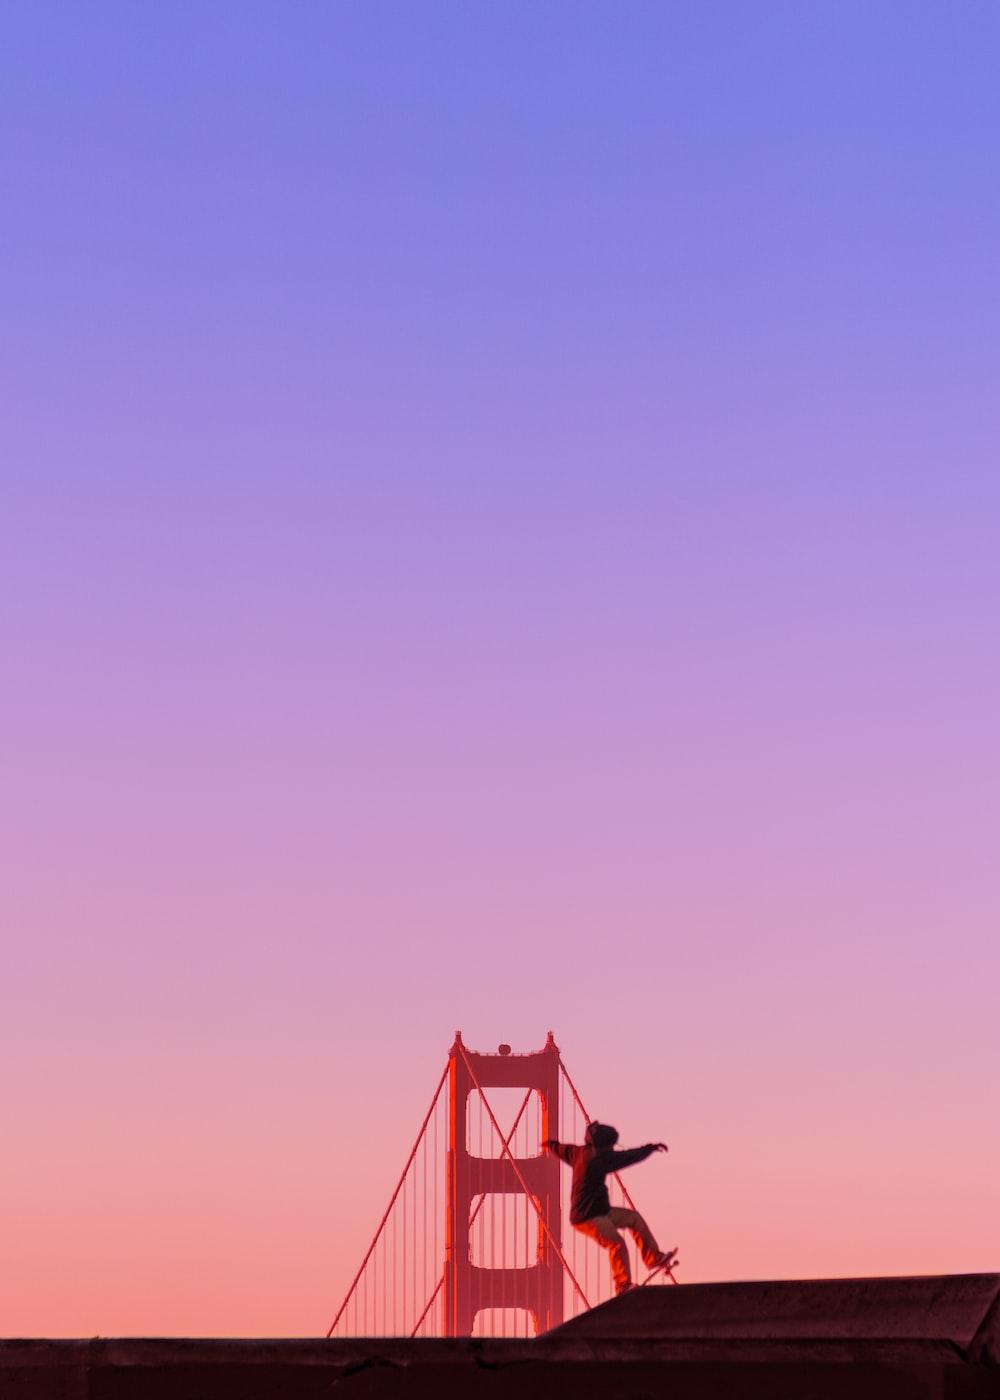 man riding on skateboard front of Golden Gate Bridge